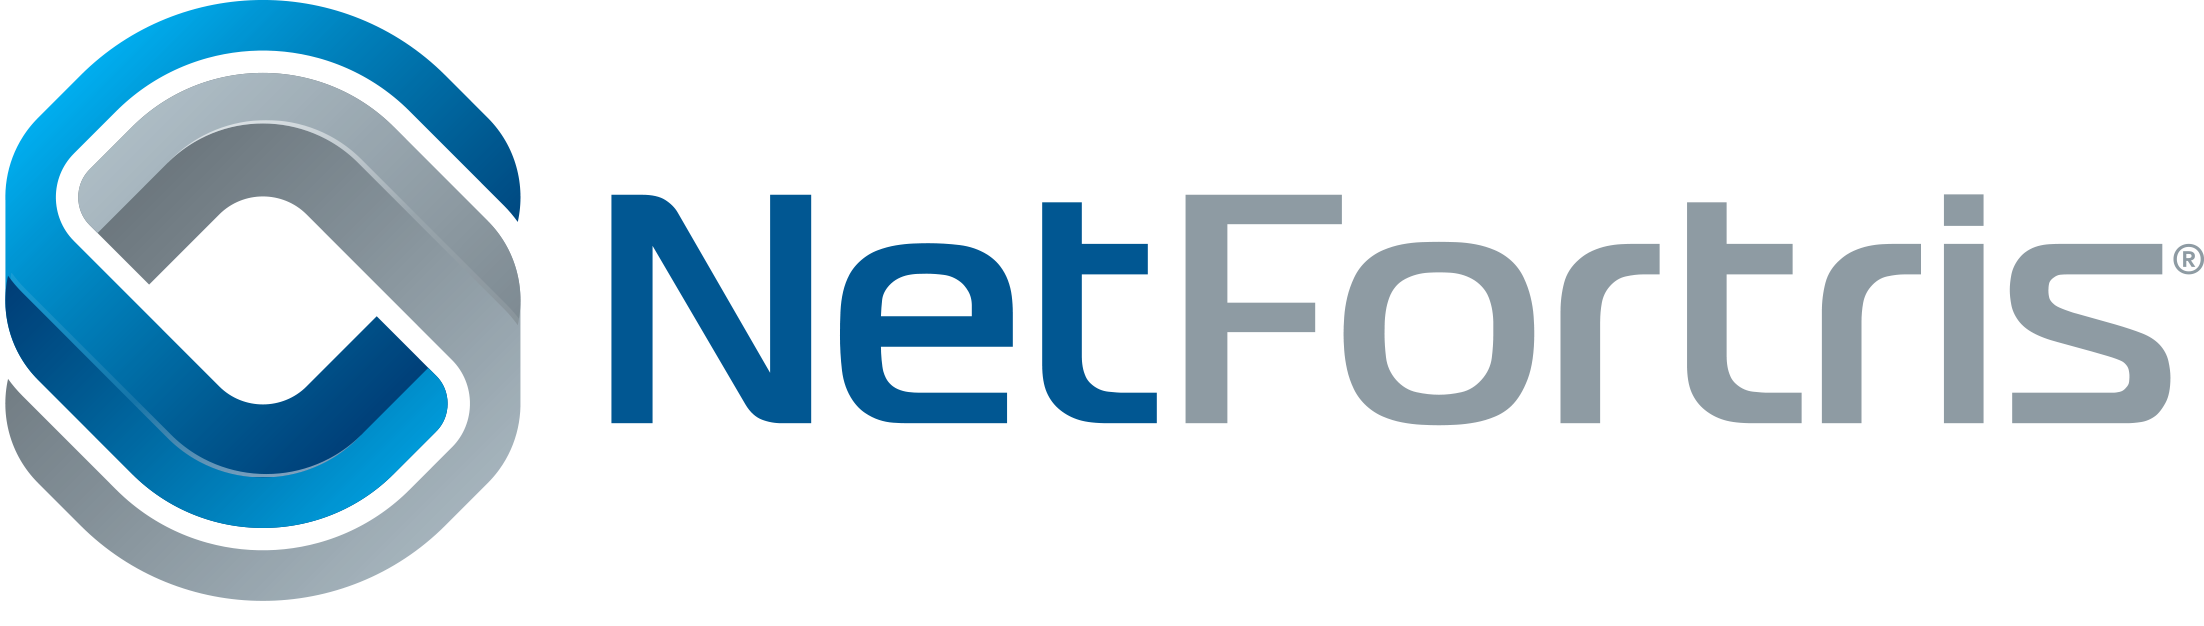 https://www.chasetek.com/wp-content/uploads/2018/02/NetFortris-Logo.png